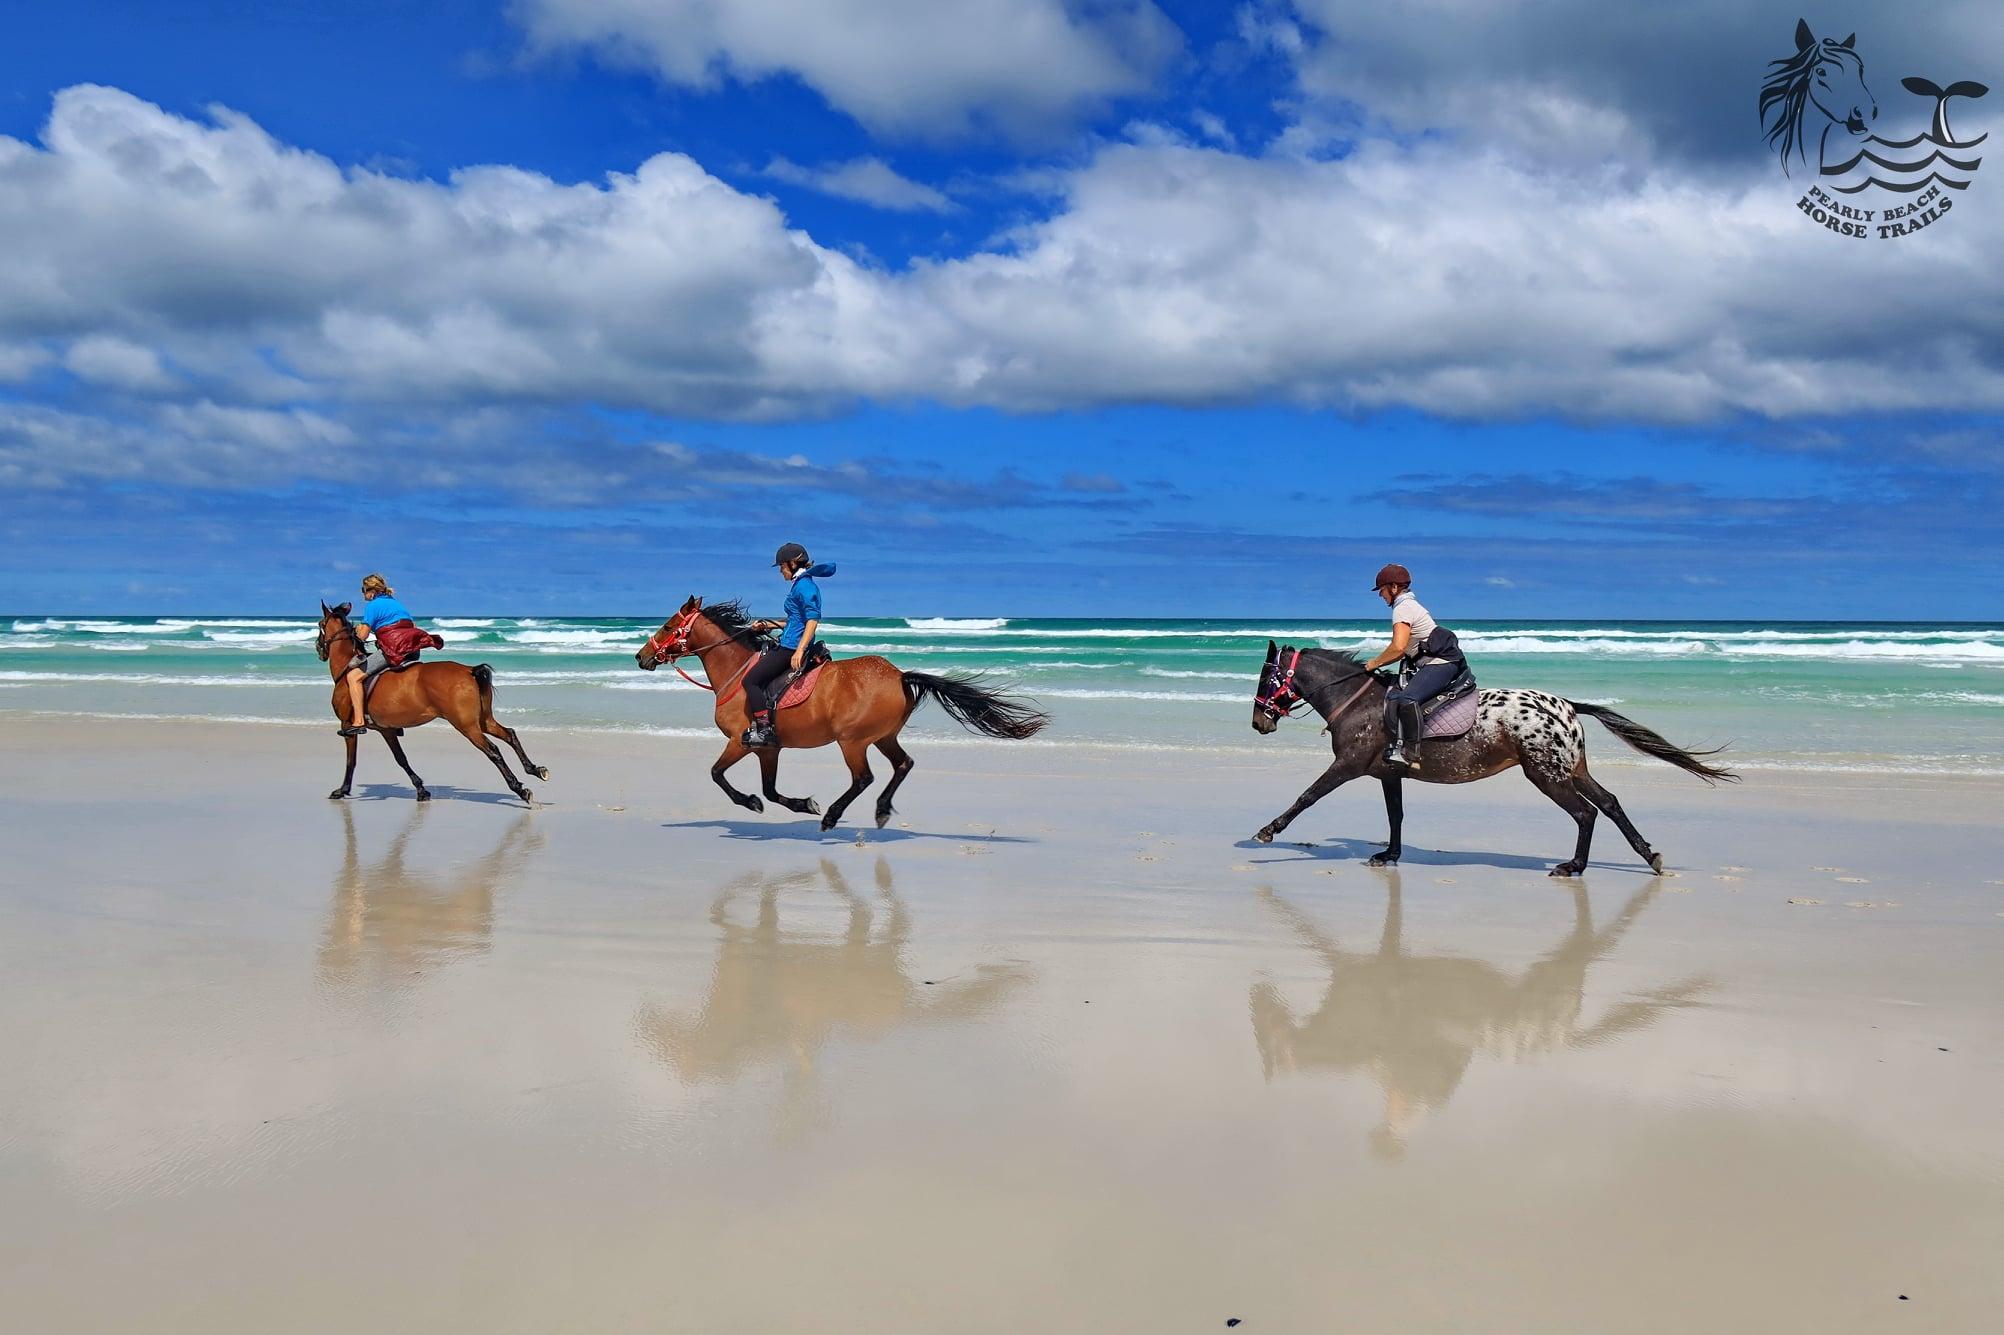 Pearly Beach Horse Trails via Facebook